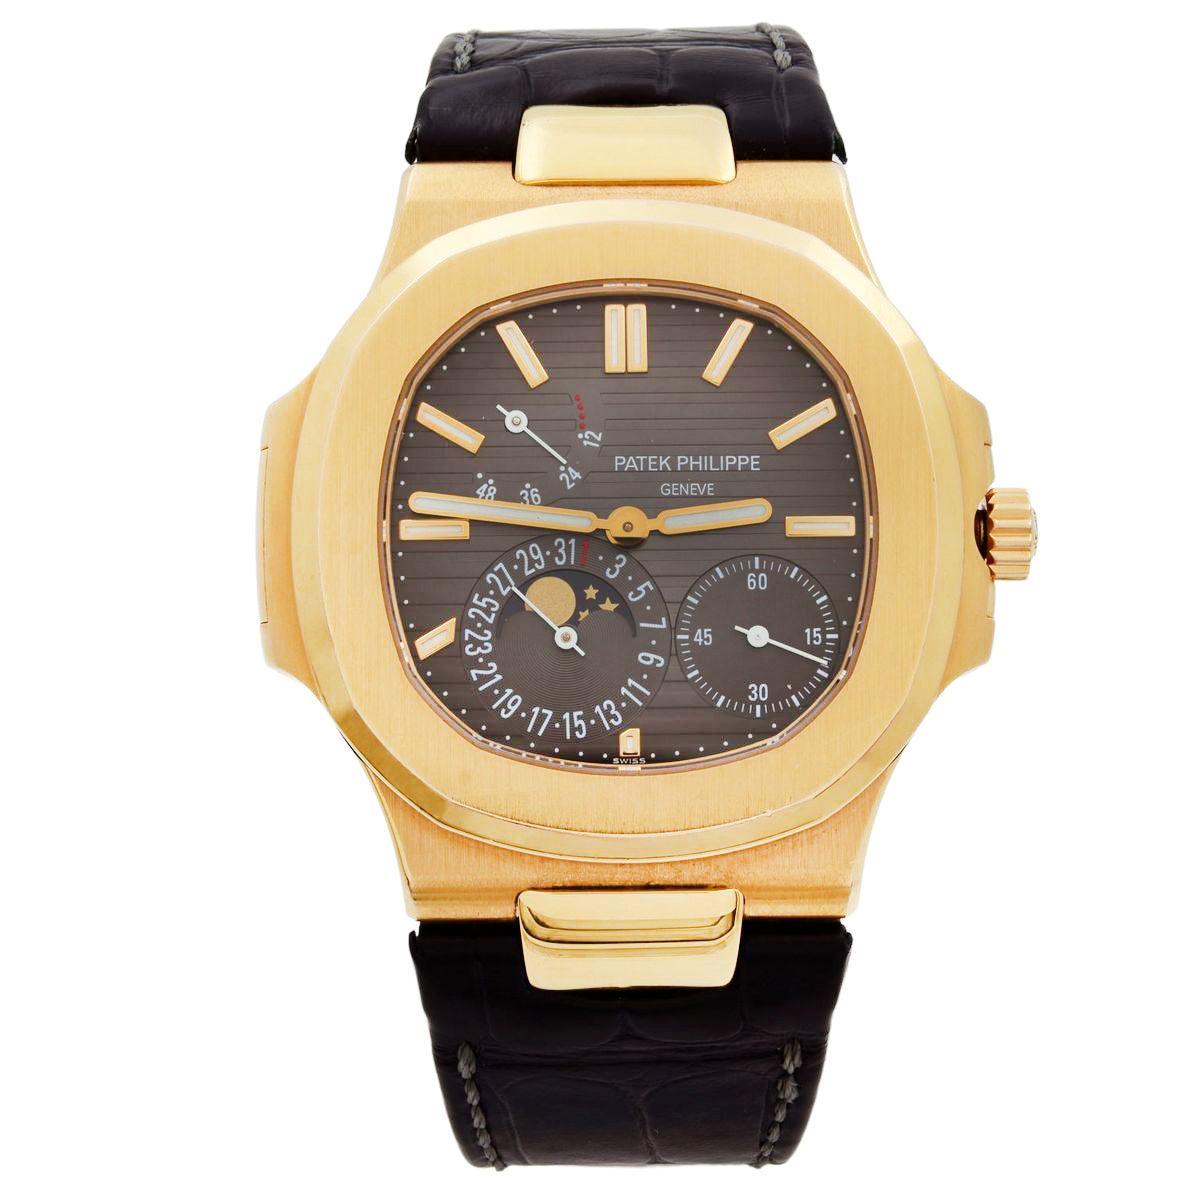 Patek Philippe Nautilus 18 Karat Rose Gold Moon Phase Automatic Watch 5712R-001